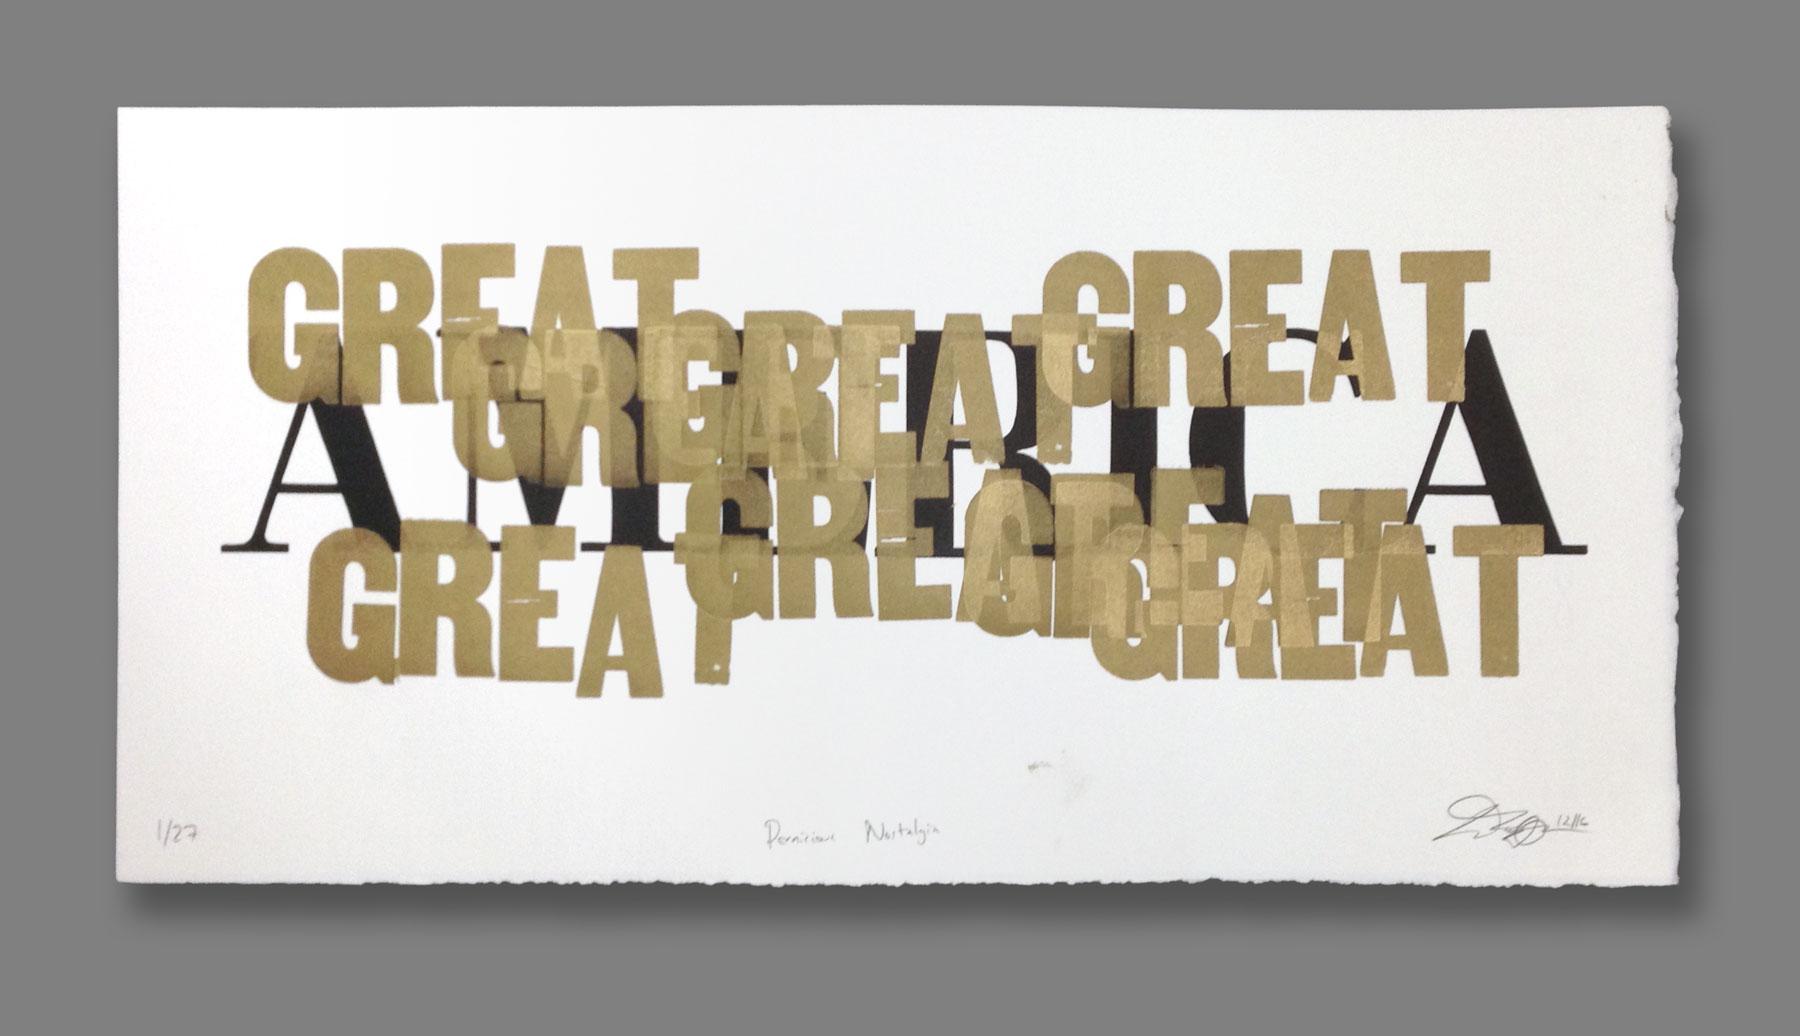 Ted Ollier ,  Pernicious Nostalgia (1/27) , letterpress on paper